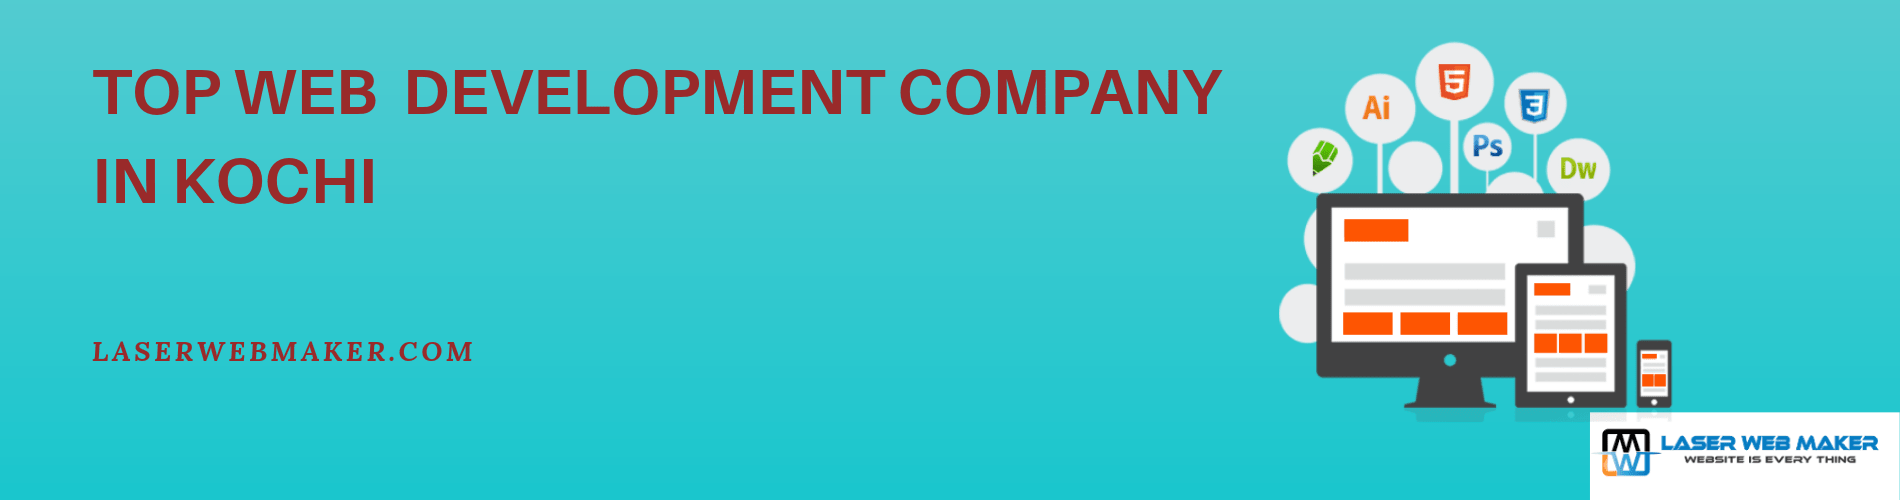 Top Web Development Company In Kochi